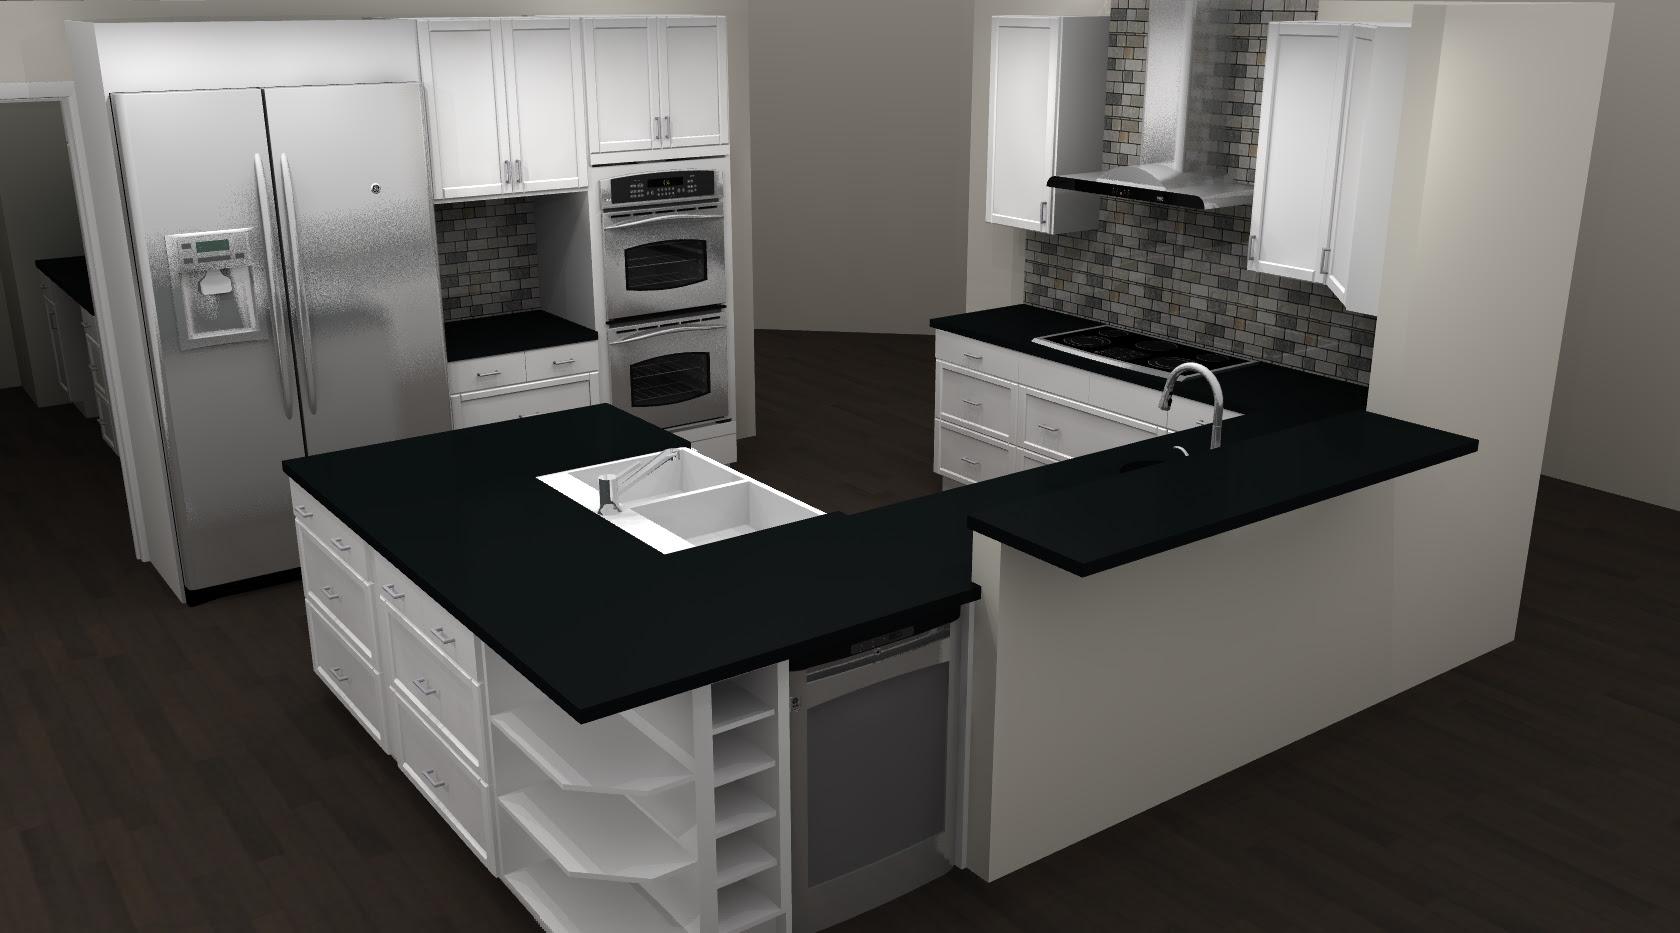 Sektion IKEA Kitchen Cabinets